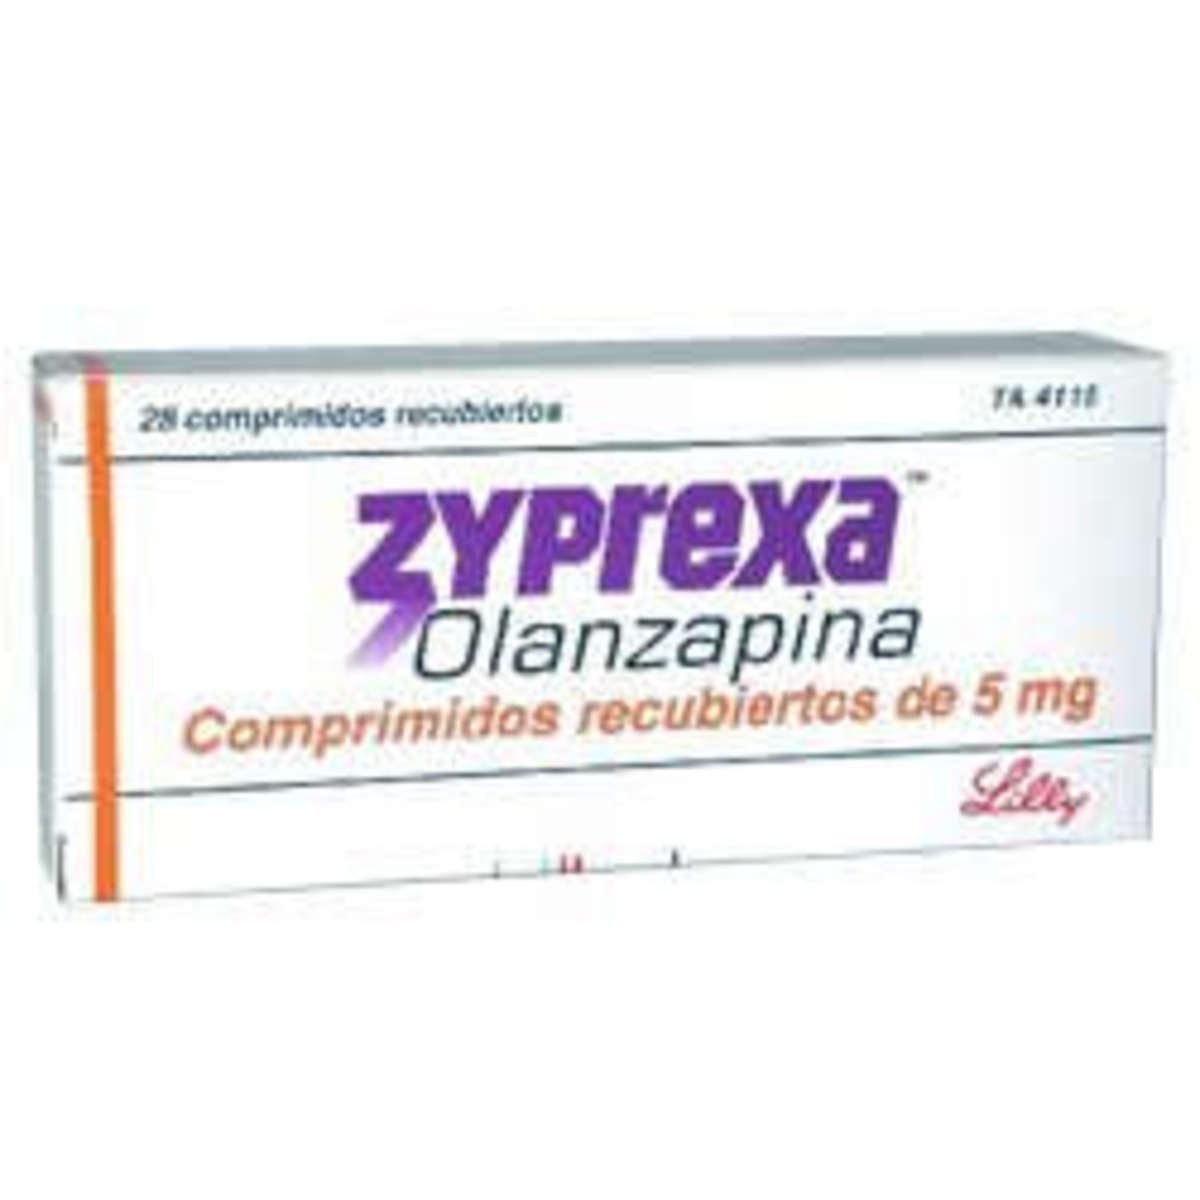 Why does antipsychotic Olanzapine (Zyprexa) increase ...